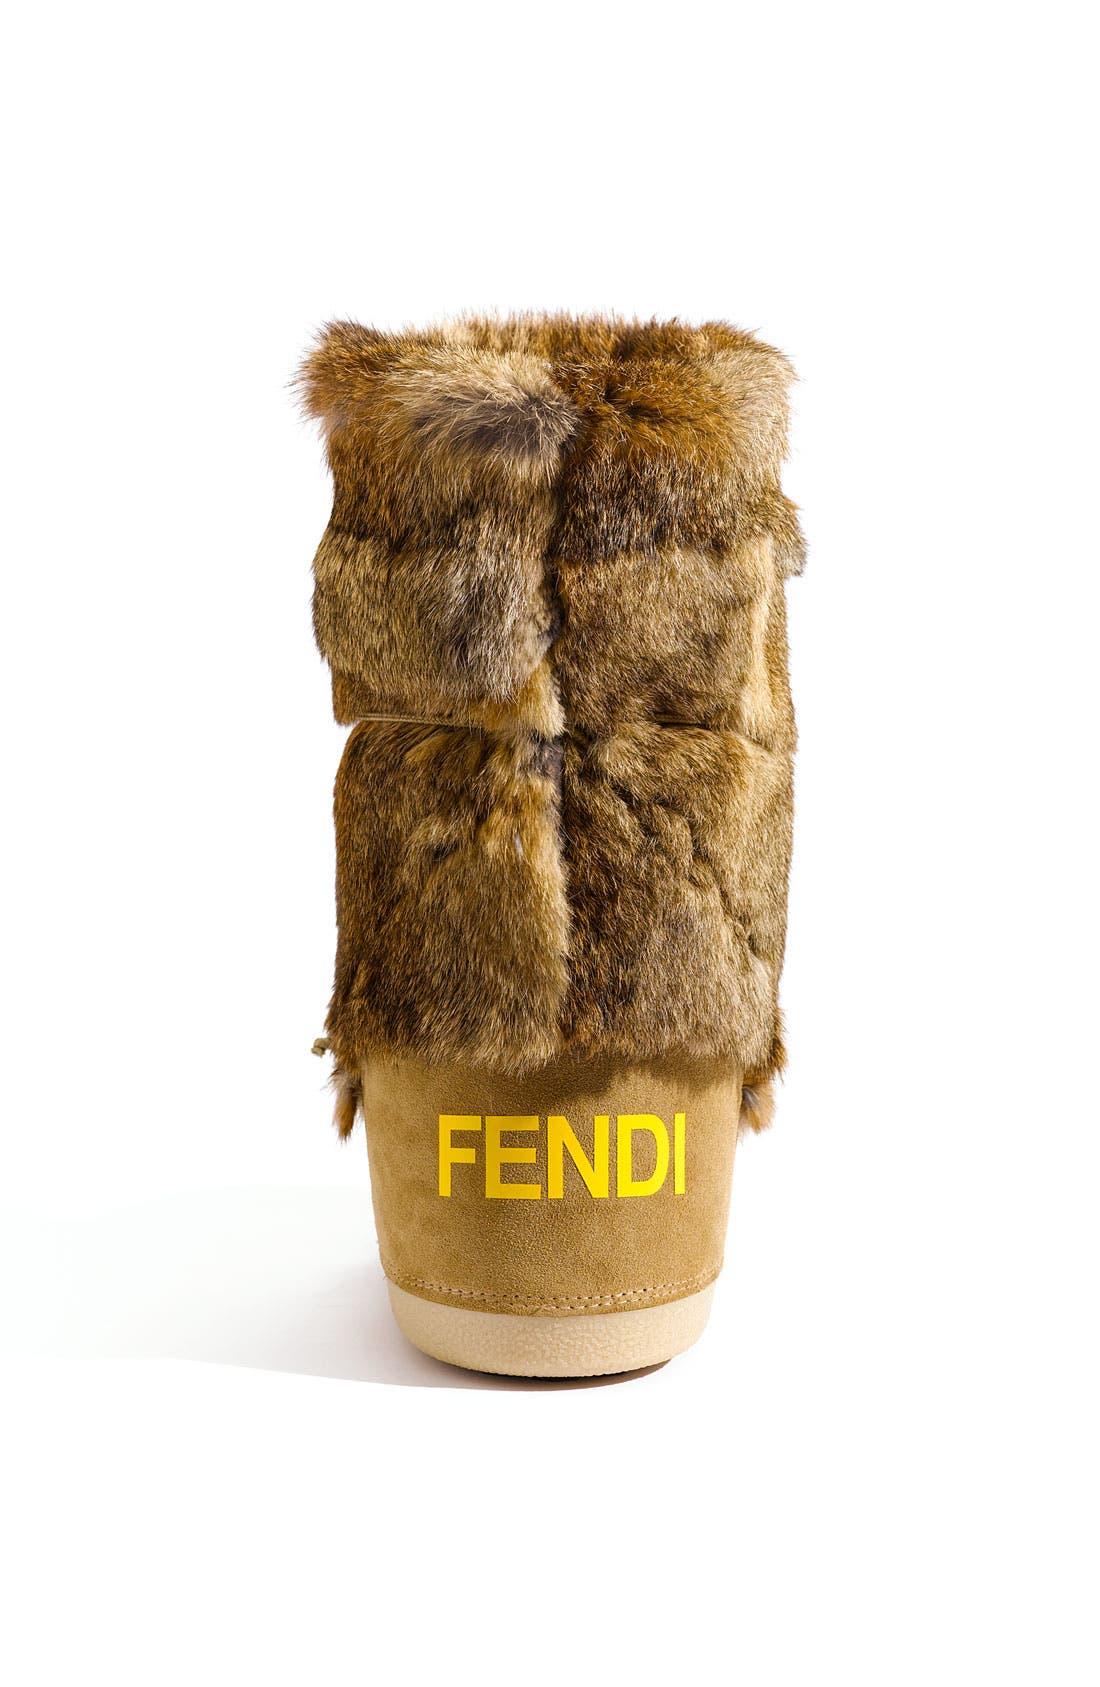 FENDI,                             'St. Mortiz' Boot,                             Alternate thumbnail 2, color,                             200